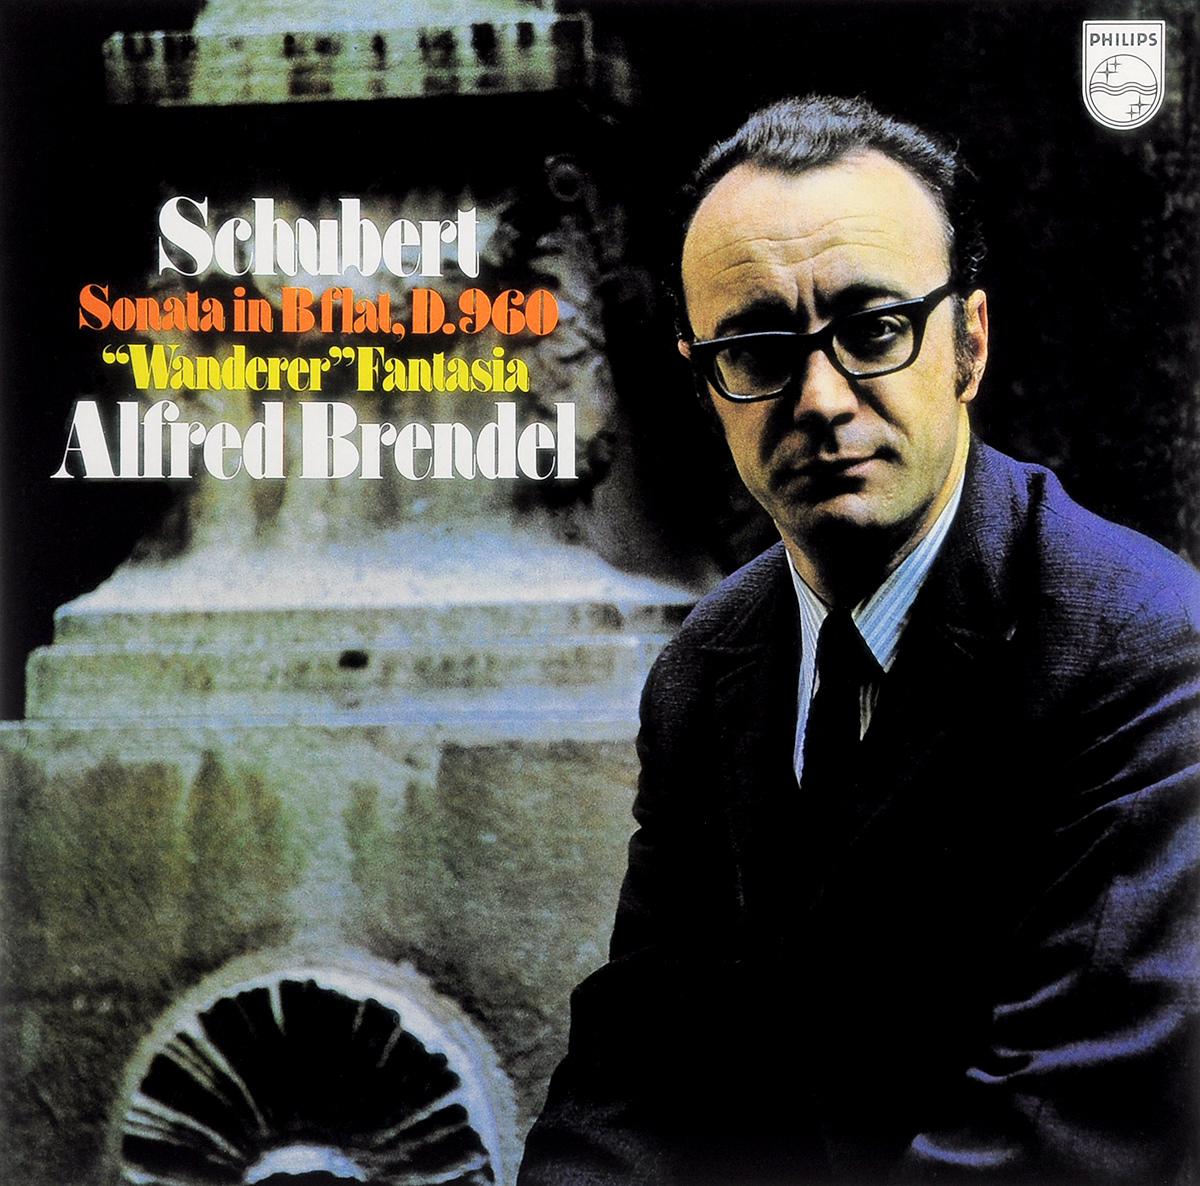 Альфред Брендель Alfred Brendel. Schubert. Sonata In B Flat, D. 960 / Wanderer Fantasia (LP) альфред брендель alfred brendel schubert complete impromptus